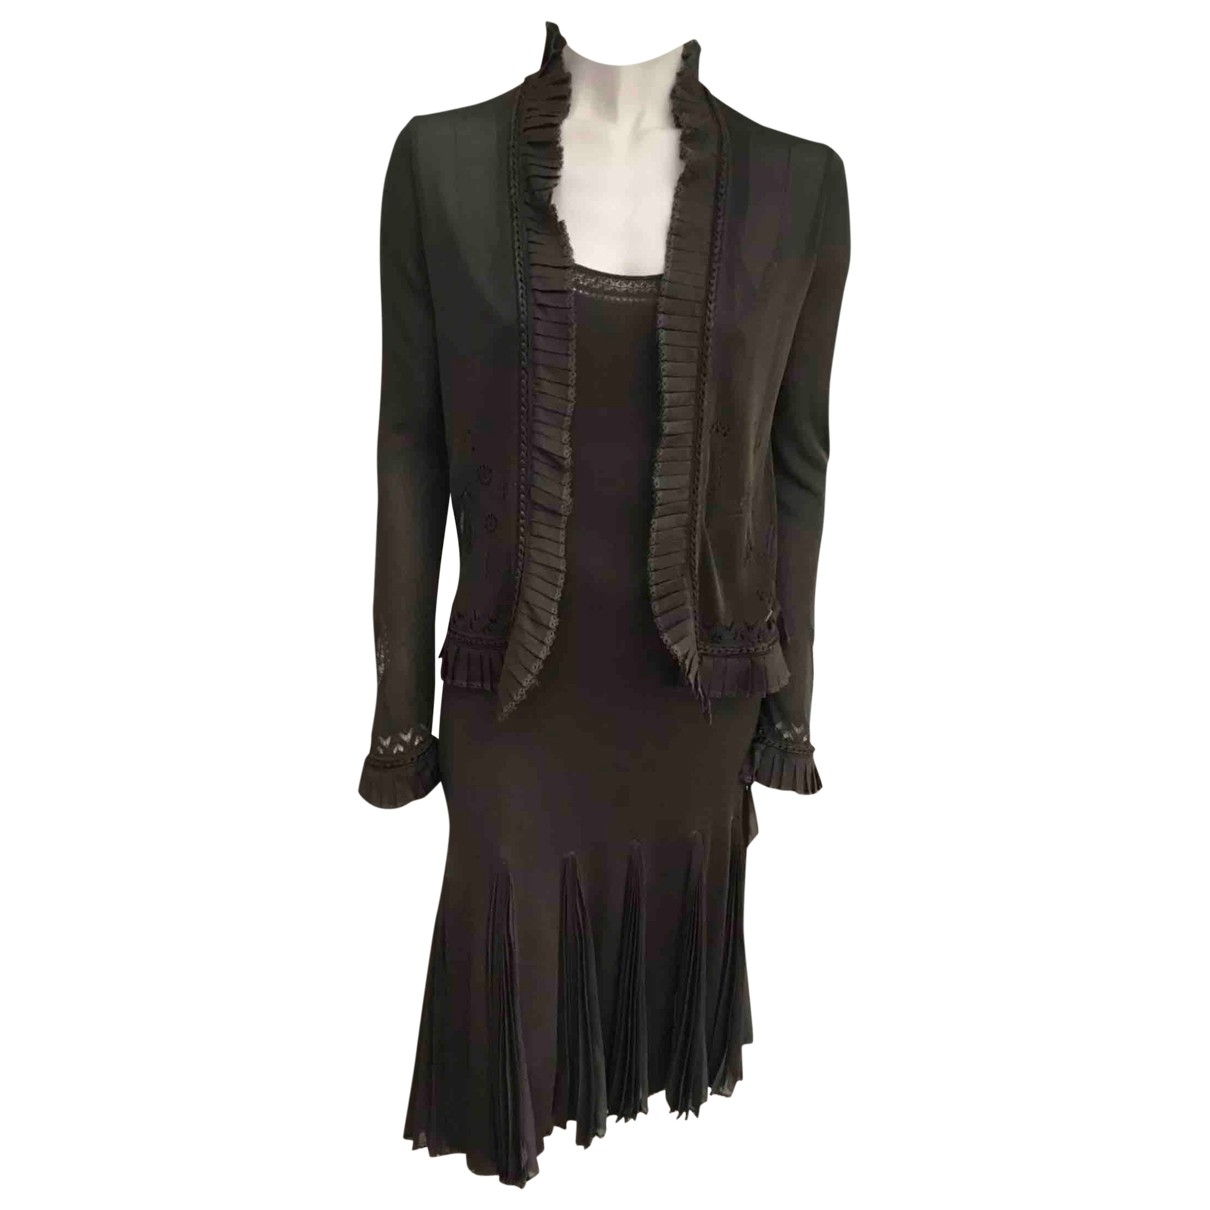 Chanel \N Kleid in  Braun Synthetik